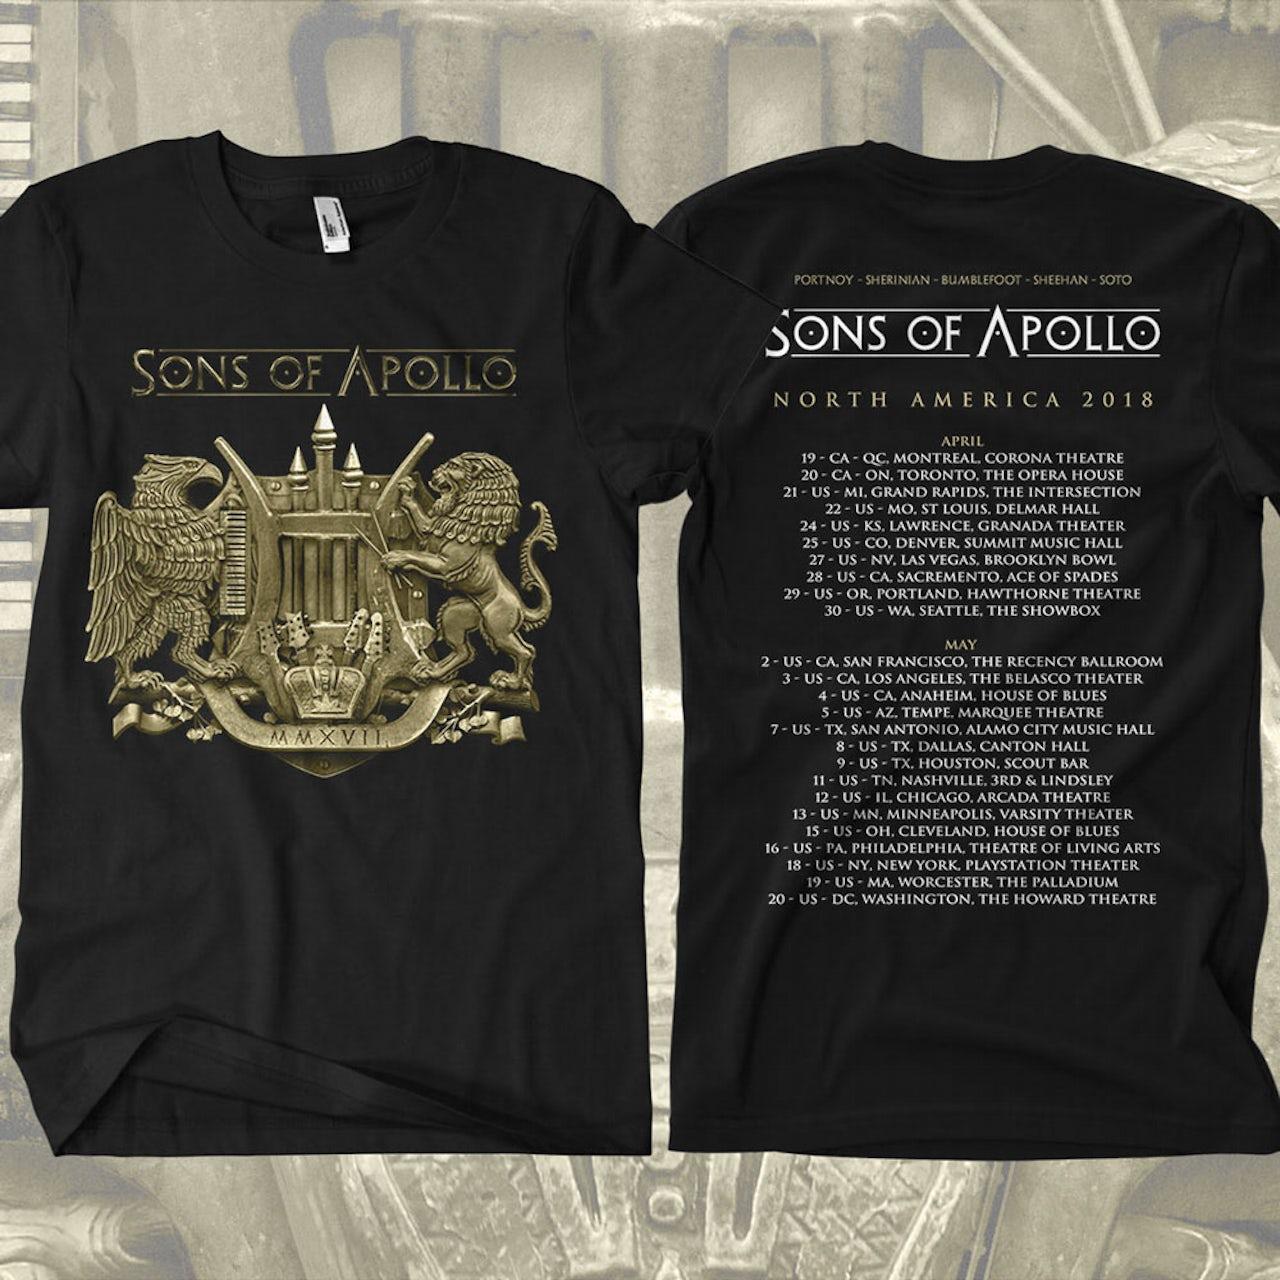 2a3f1dc81f5 Sons Of Apollo North America 2018 Tour Dates Black T-Shirt